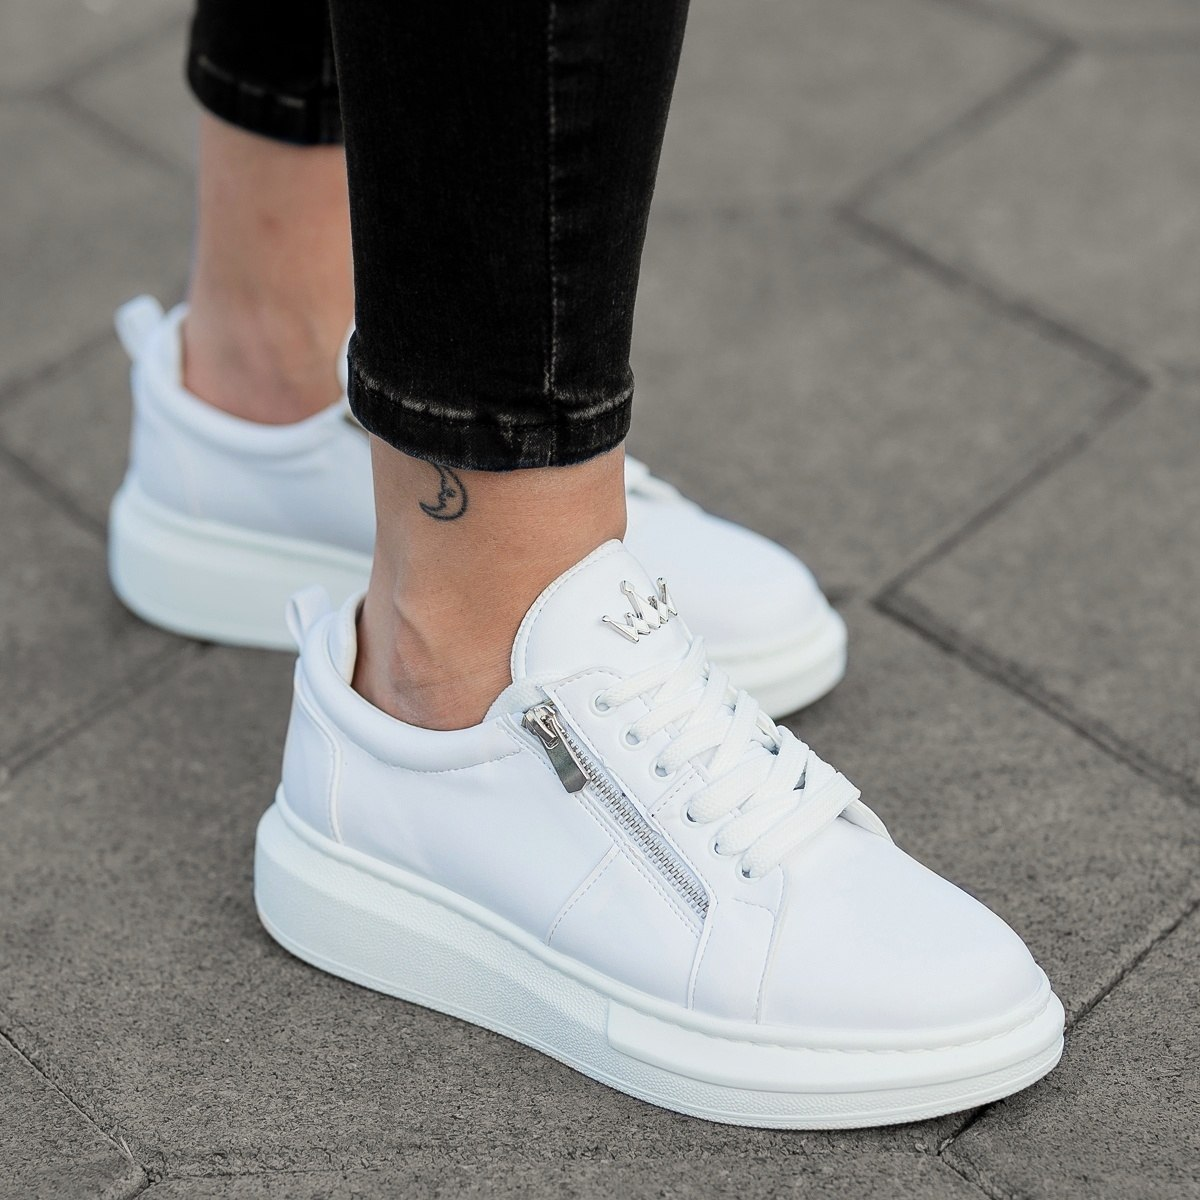 Women's Hype Sole Zipped Style Sneakers in White